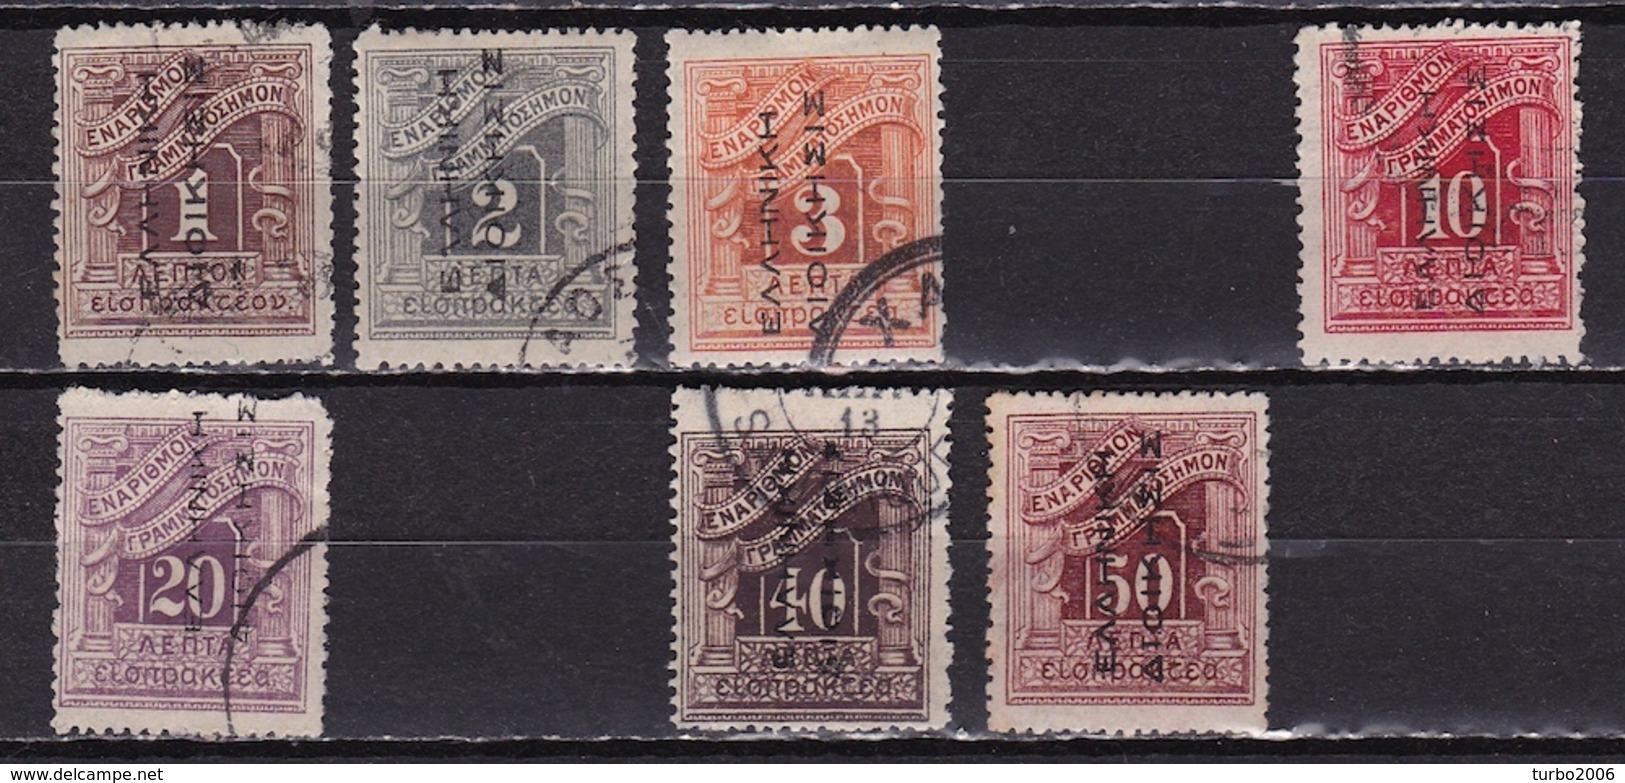 GREECE 1912 Postage Due Engraved Issue Black Overprint ELLHNIKH DIOIKSIS 7 Values From The Set  Vl. D 39/41-43-44-46-47 - Strafport